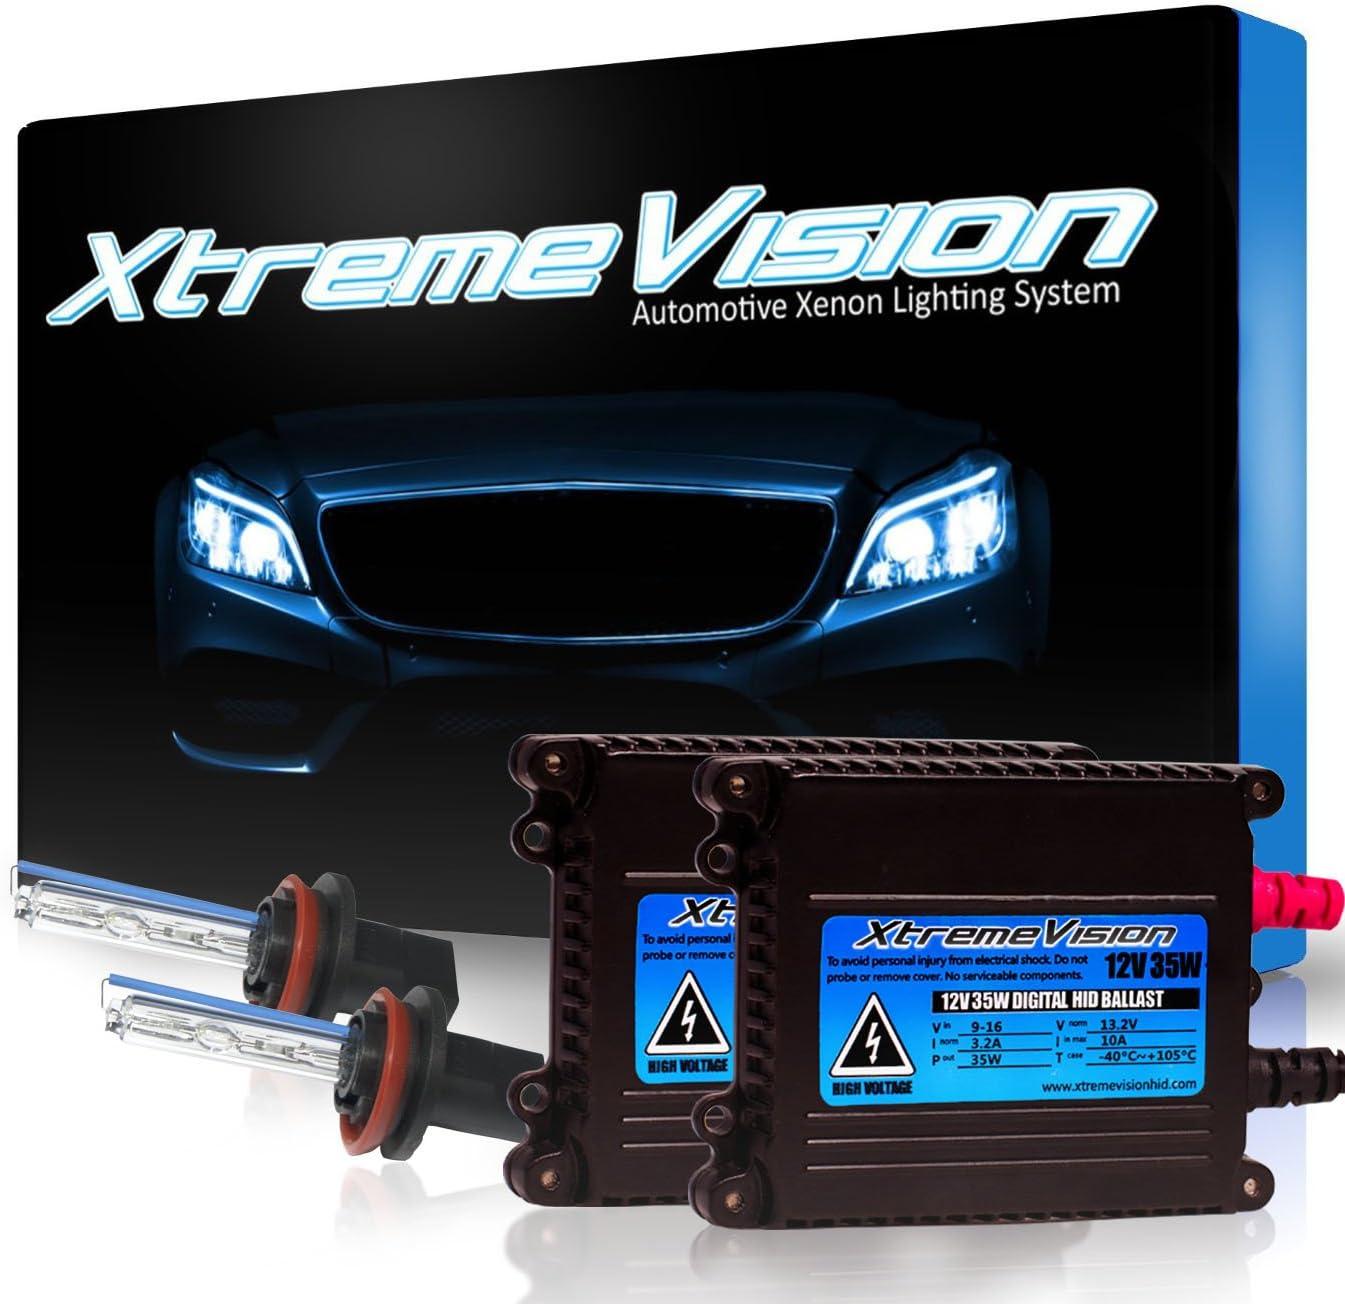 Vvme Hid Conversion Kit Wiring Diagram Residential Electrical Amazon Com Kits Lighting Automotive Rh Headlight Two Light